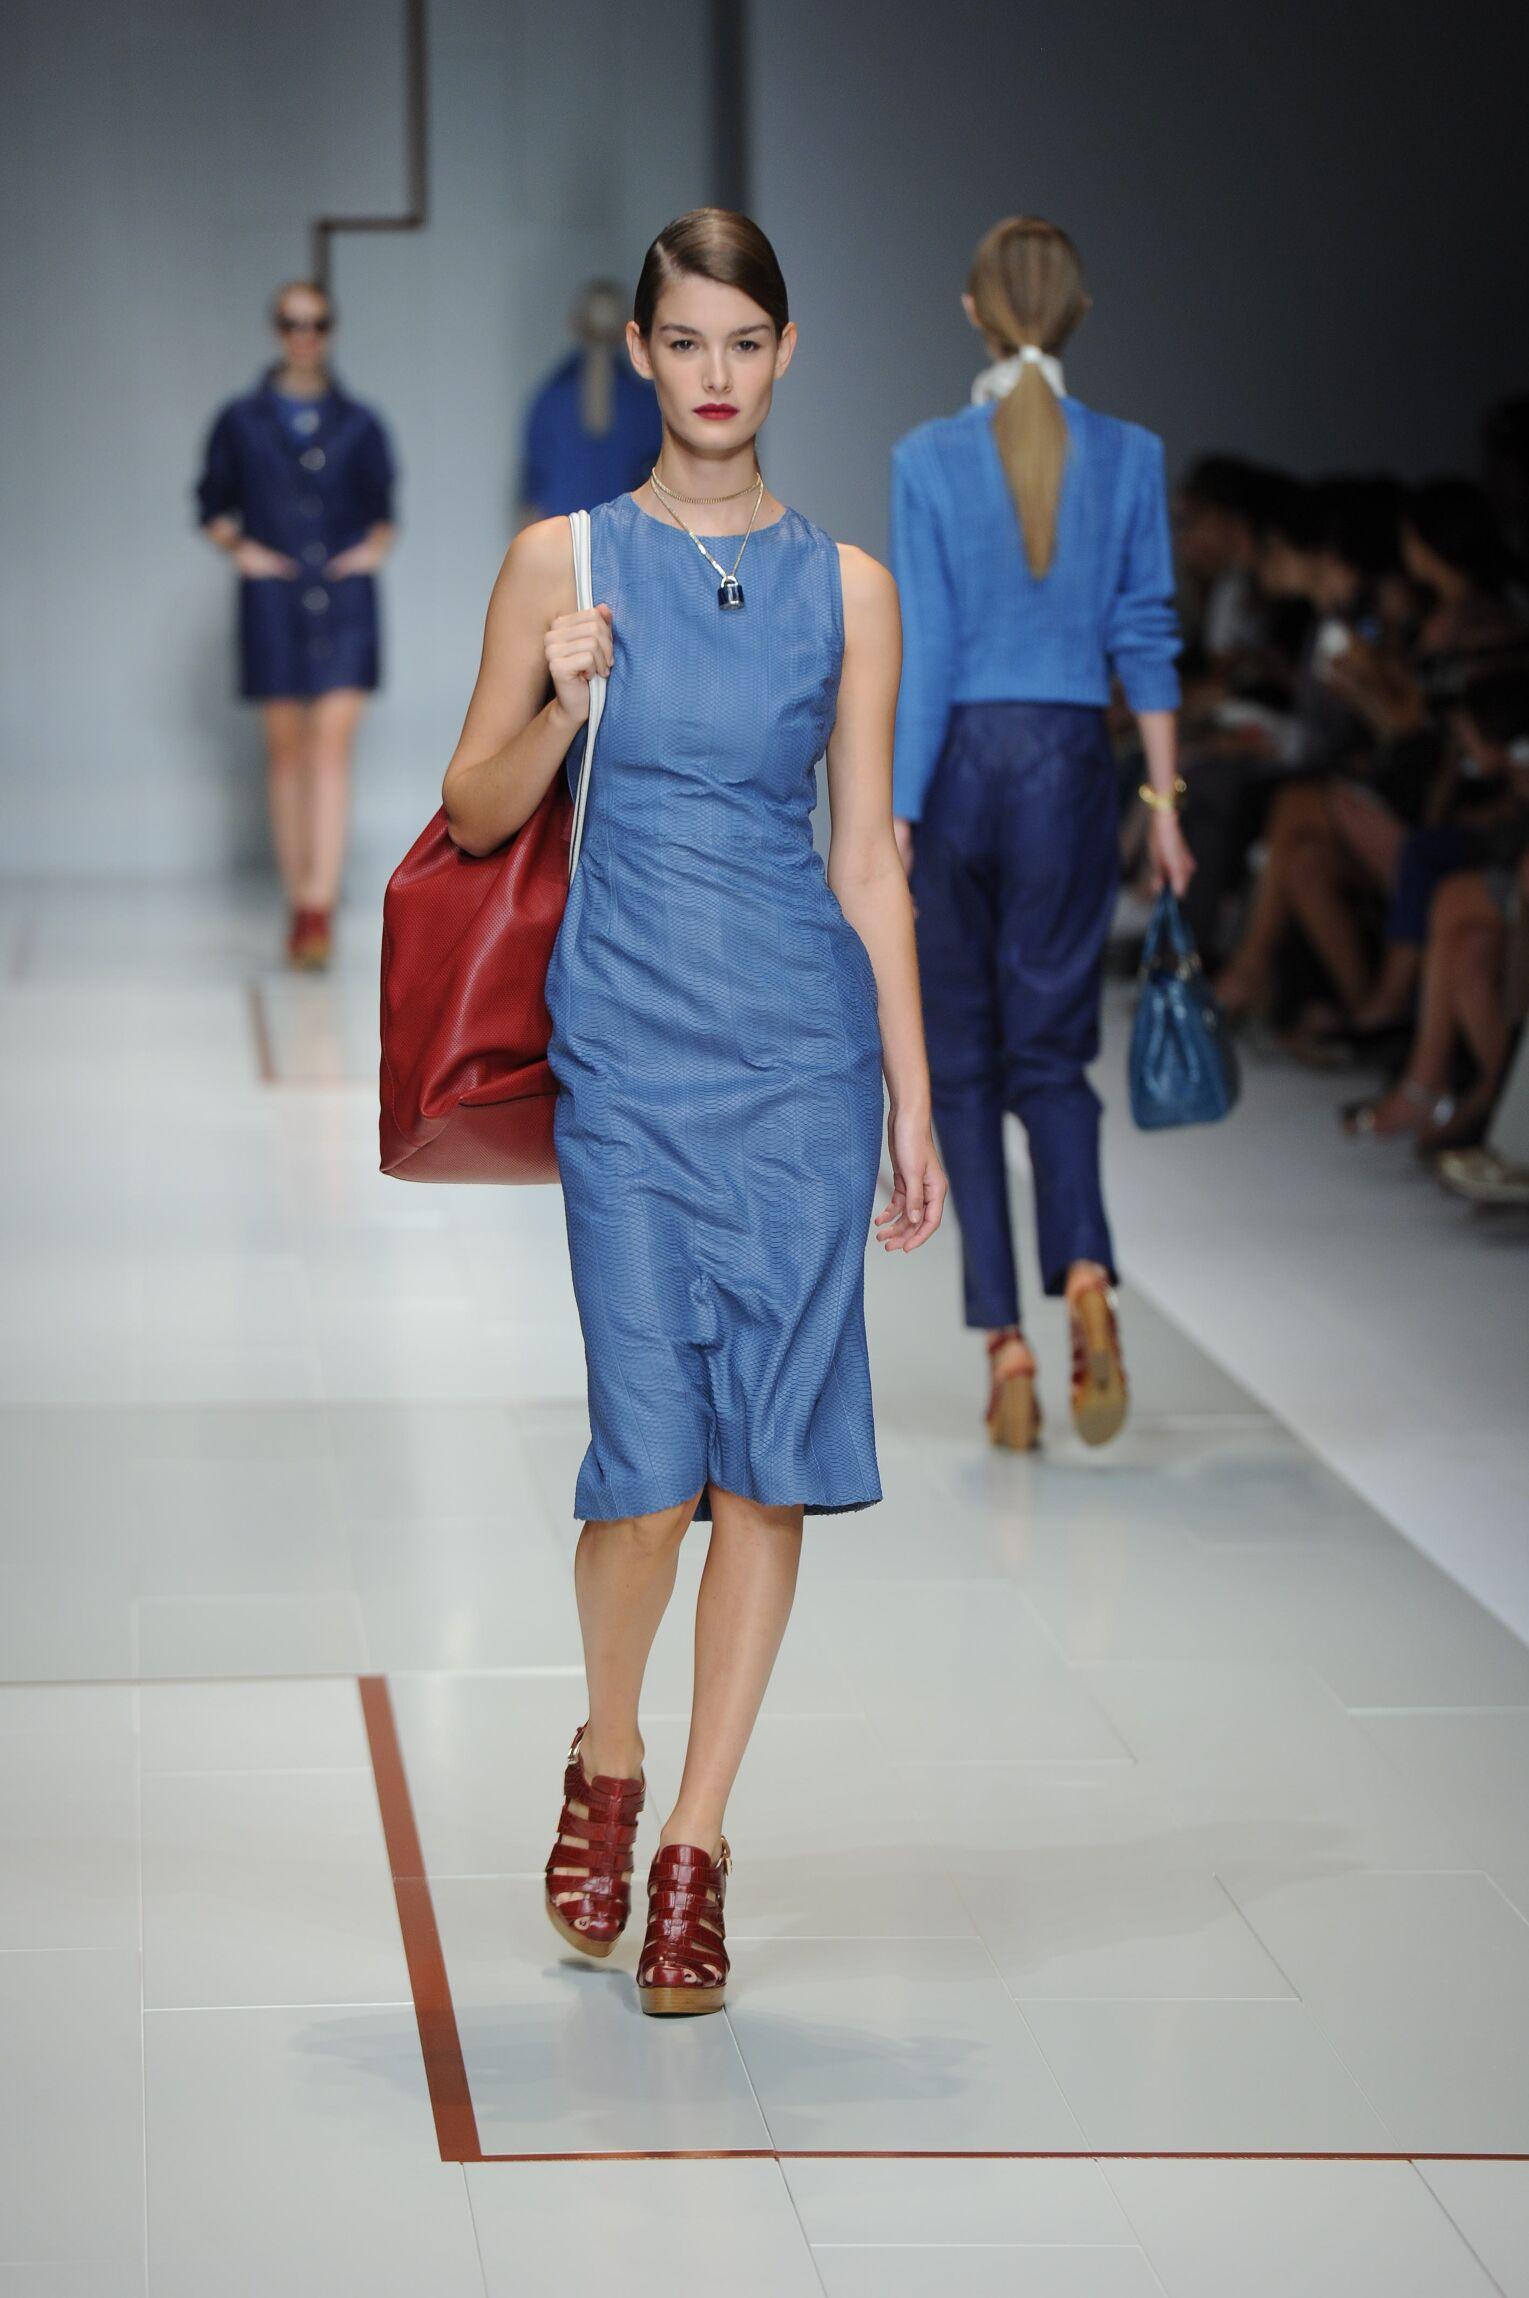 Catwalk Trussardi Woman Fashion Show Summer 2015